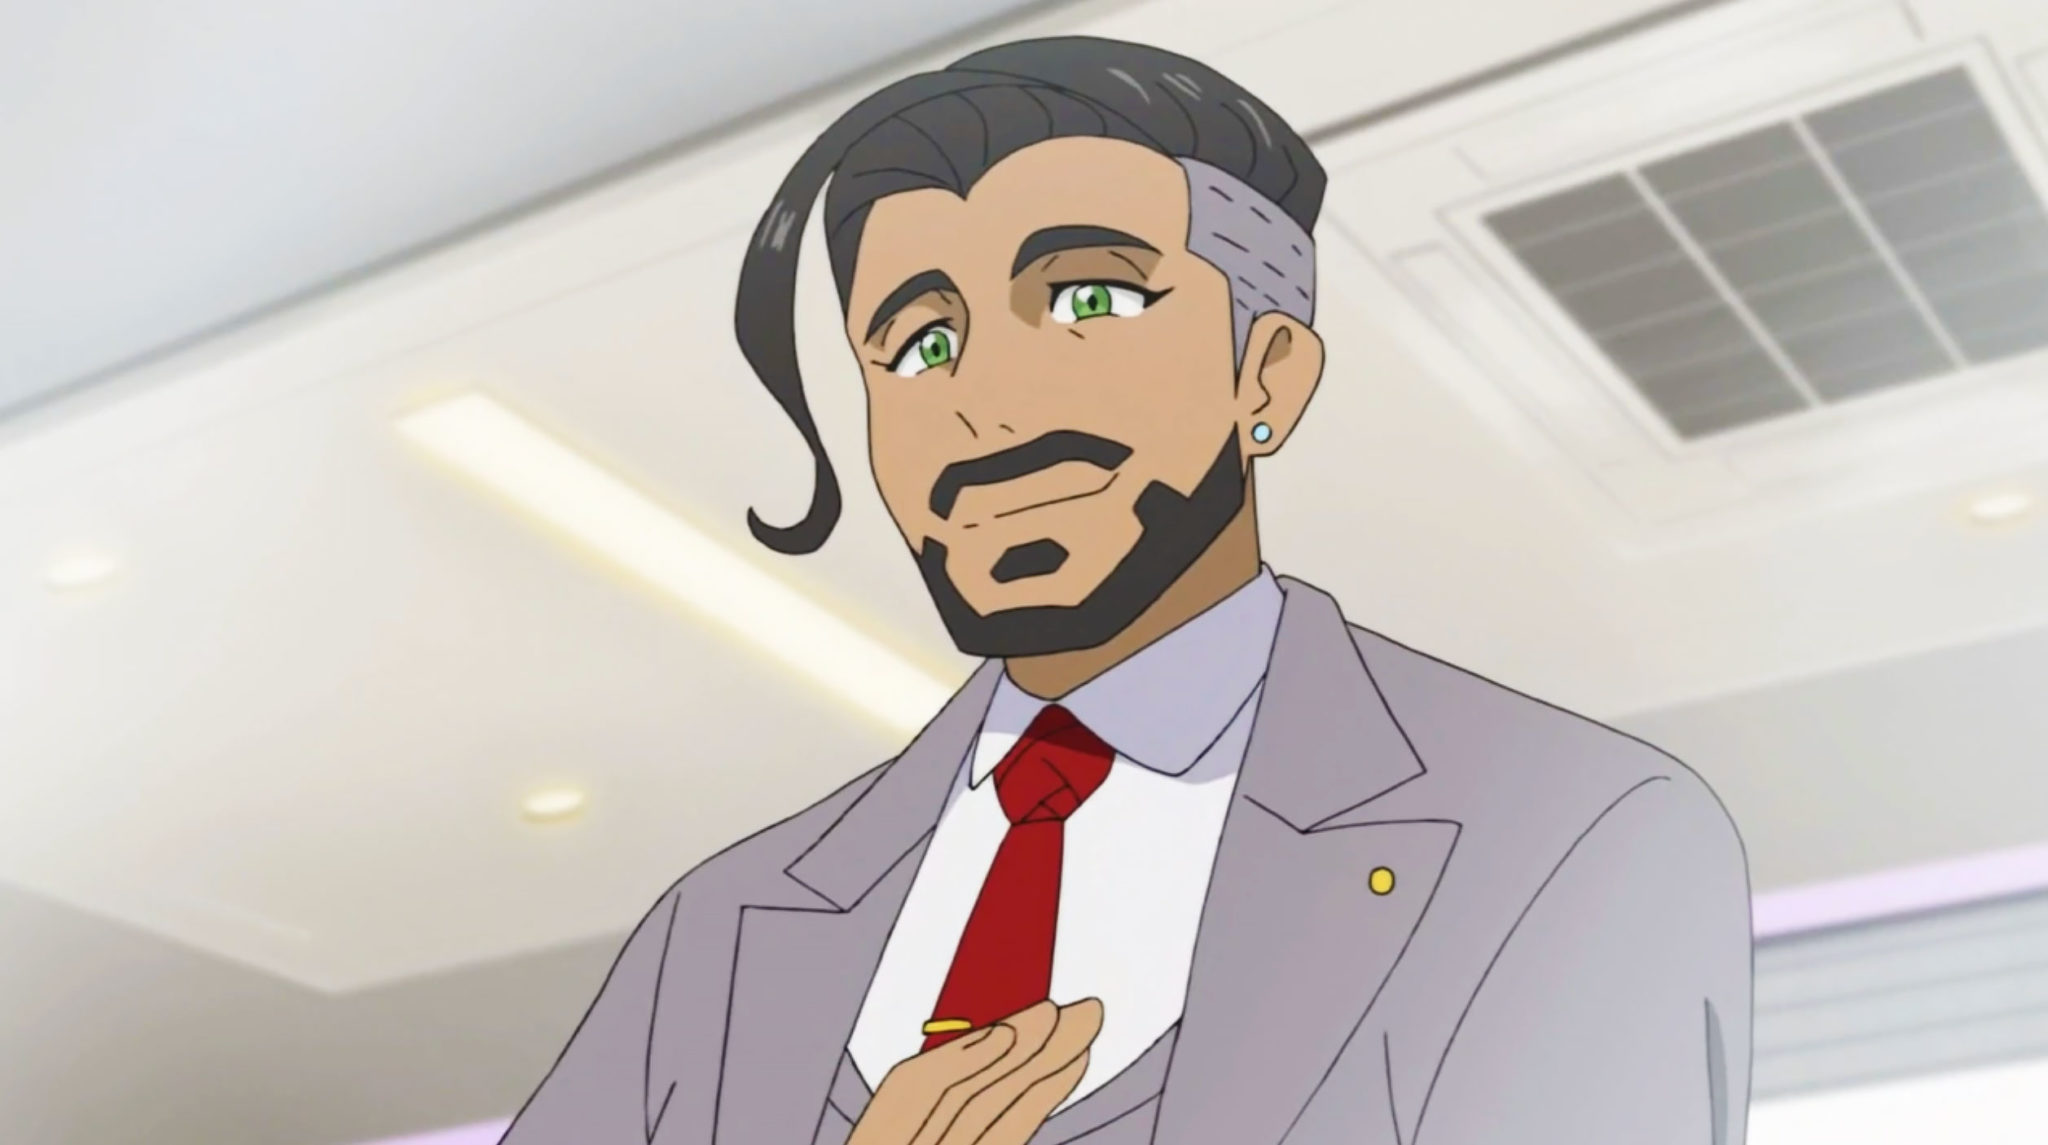 chairman rose pokemon sword shield anime